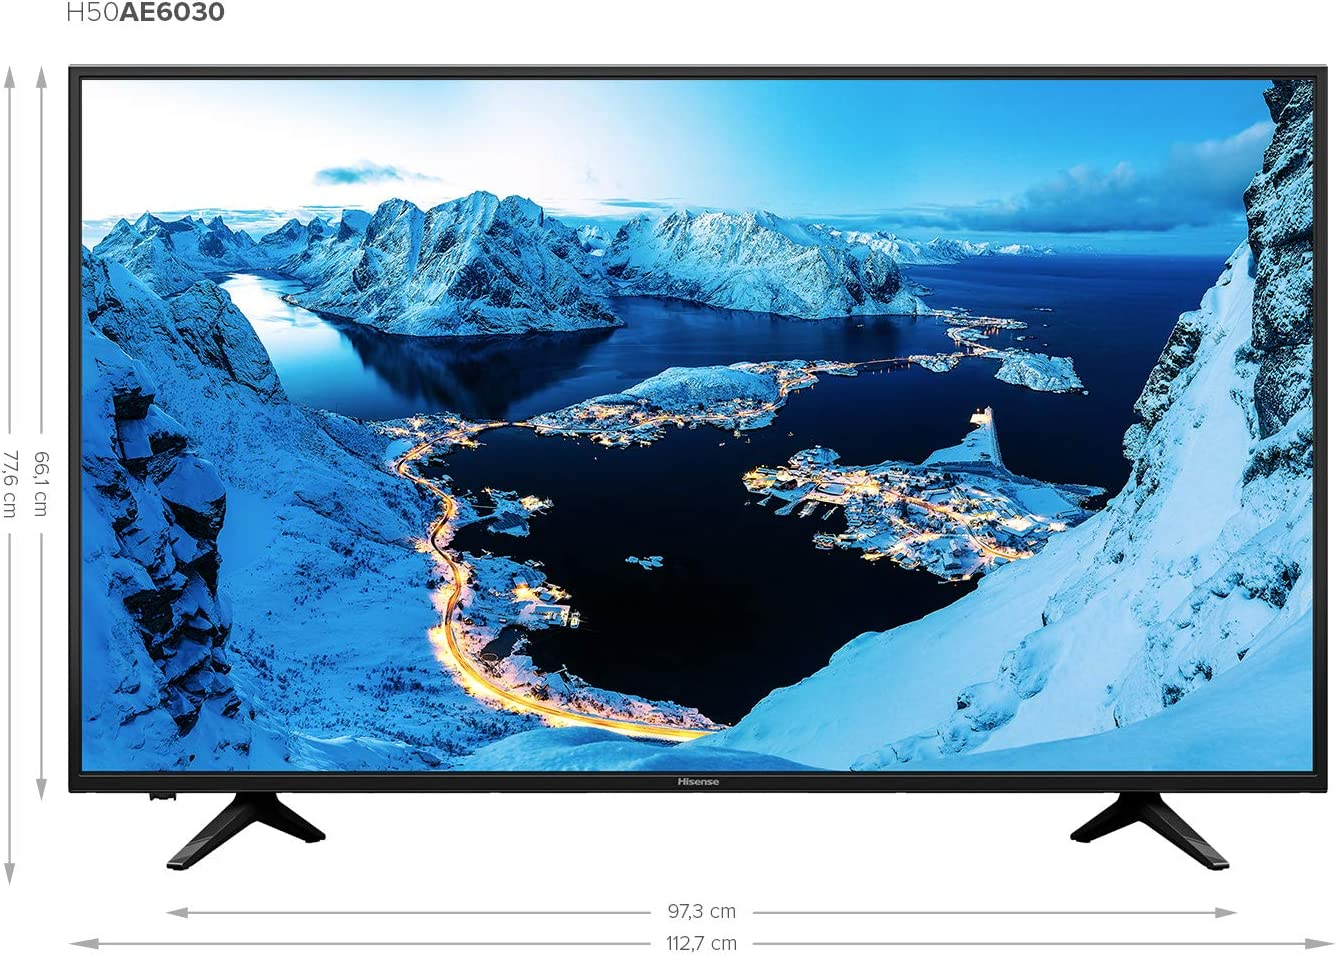 Hisense H50AE6030 - Smart TV VIDAA U, Super Contraste, Precision ...